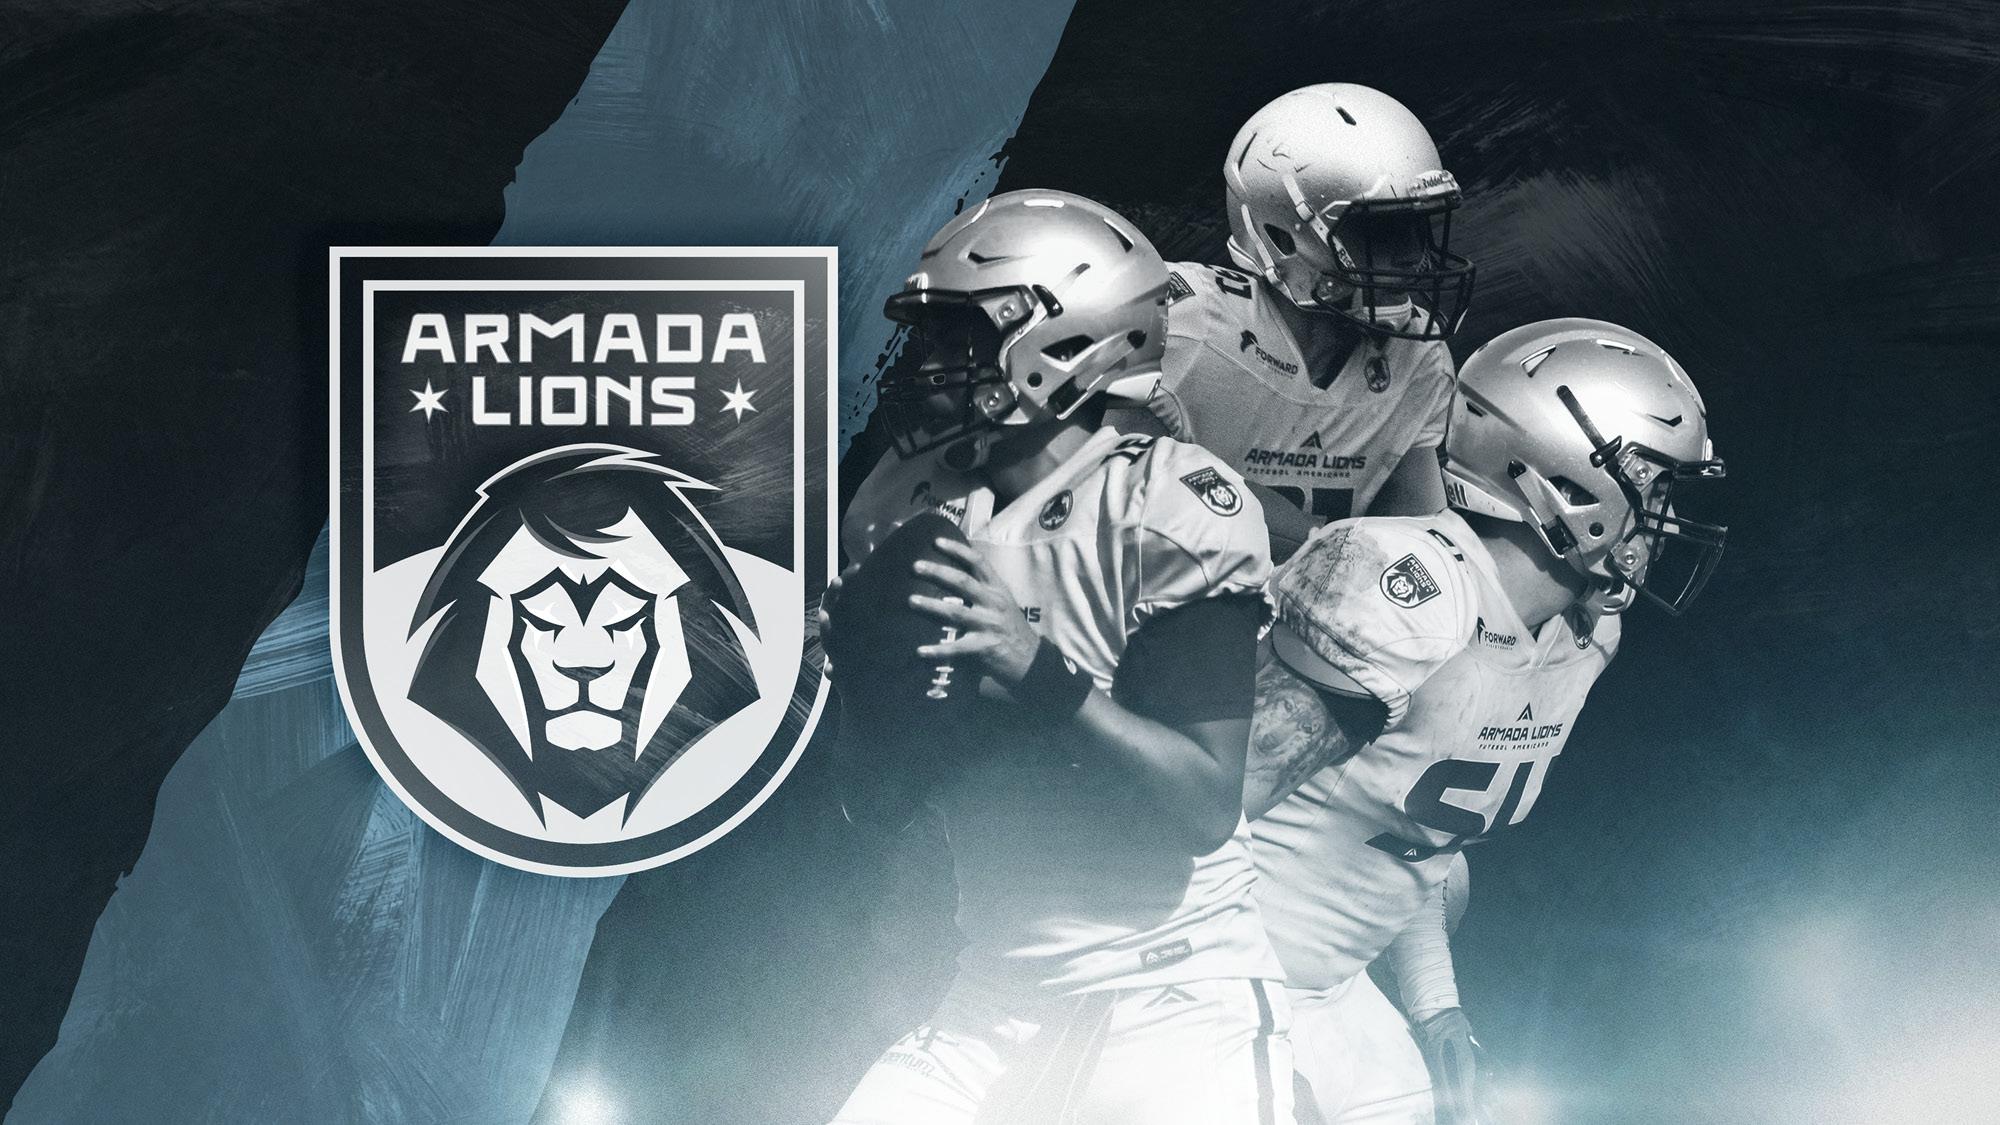 Armada Lions